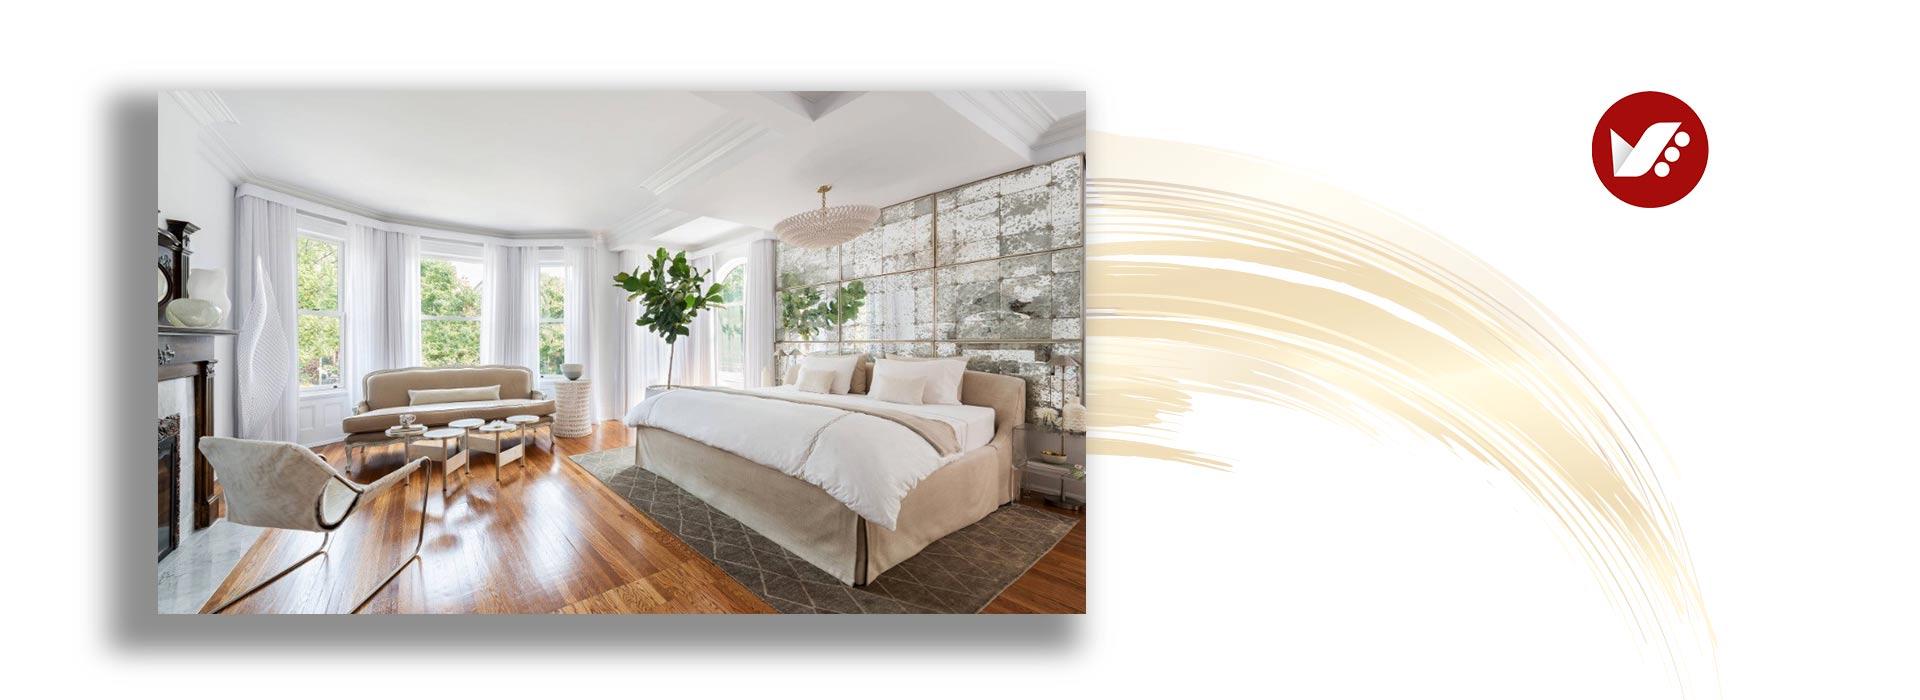 bedroom makeover taaodoljpg - تغییر دکوراسیون اتاق خواب